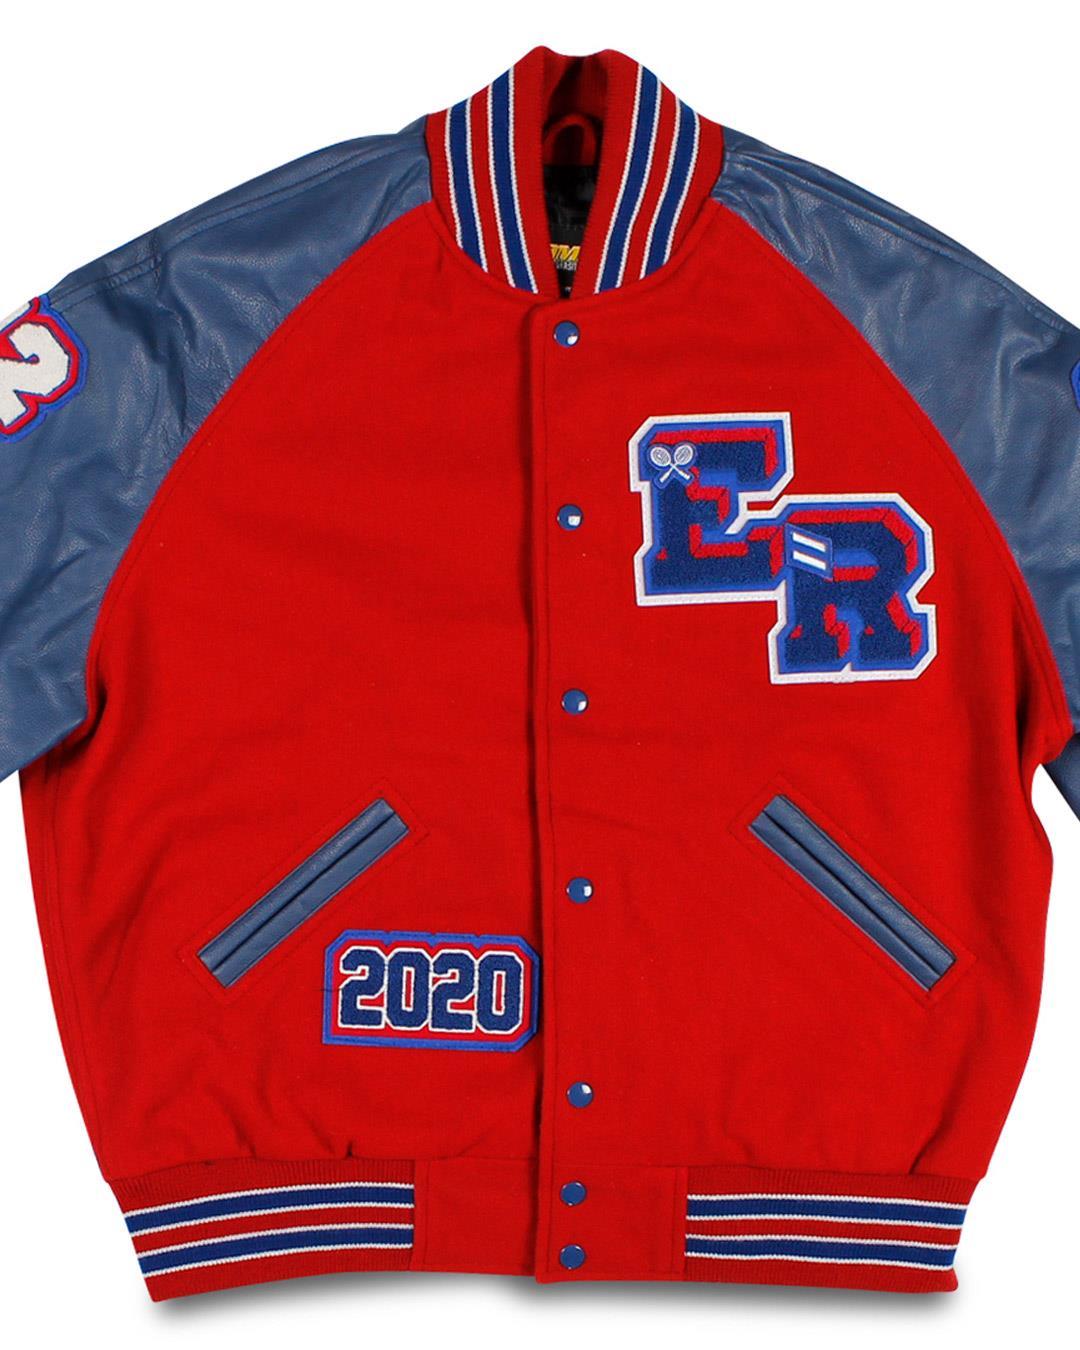 East Rankin Academy Varsity Jacket, Pelahatchie MS - Front